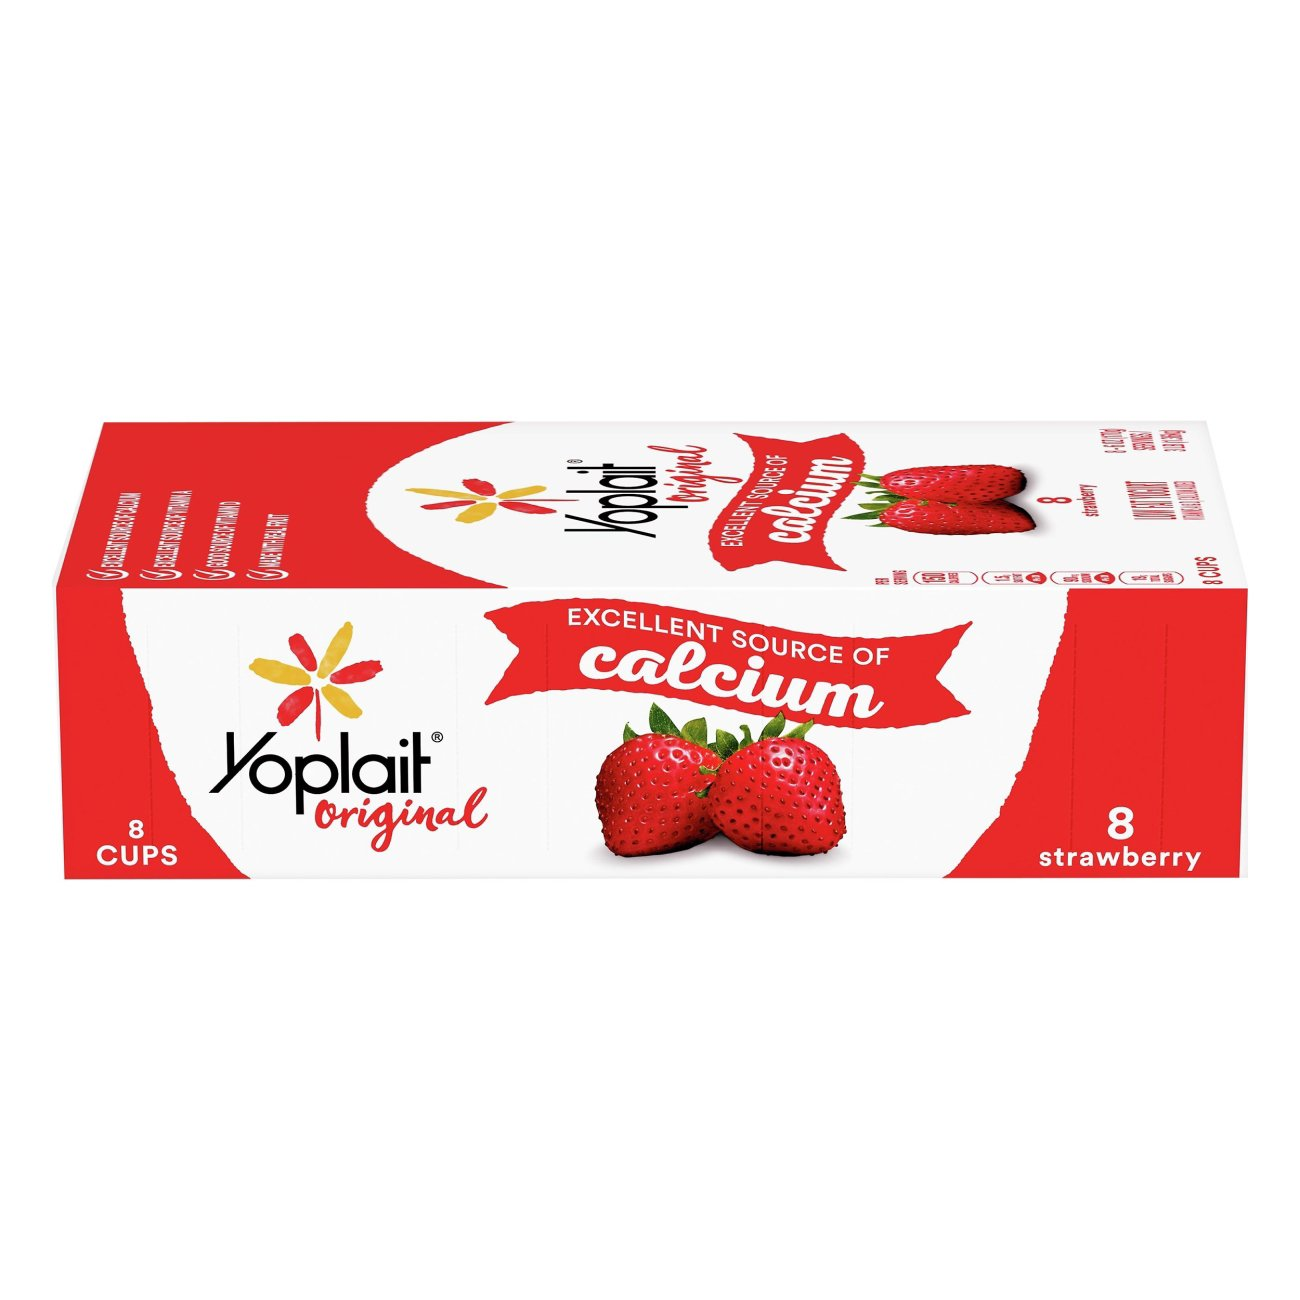 Low‑Fat Strawberry Yogurt ‑ Shop